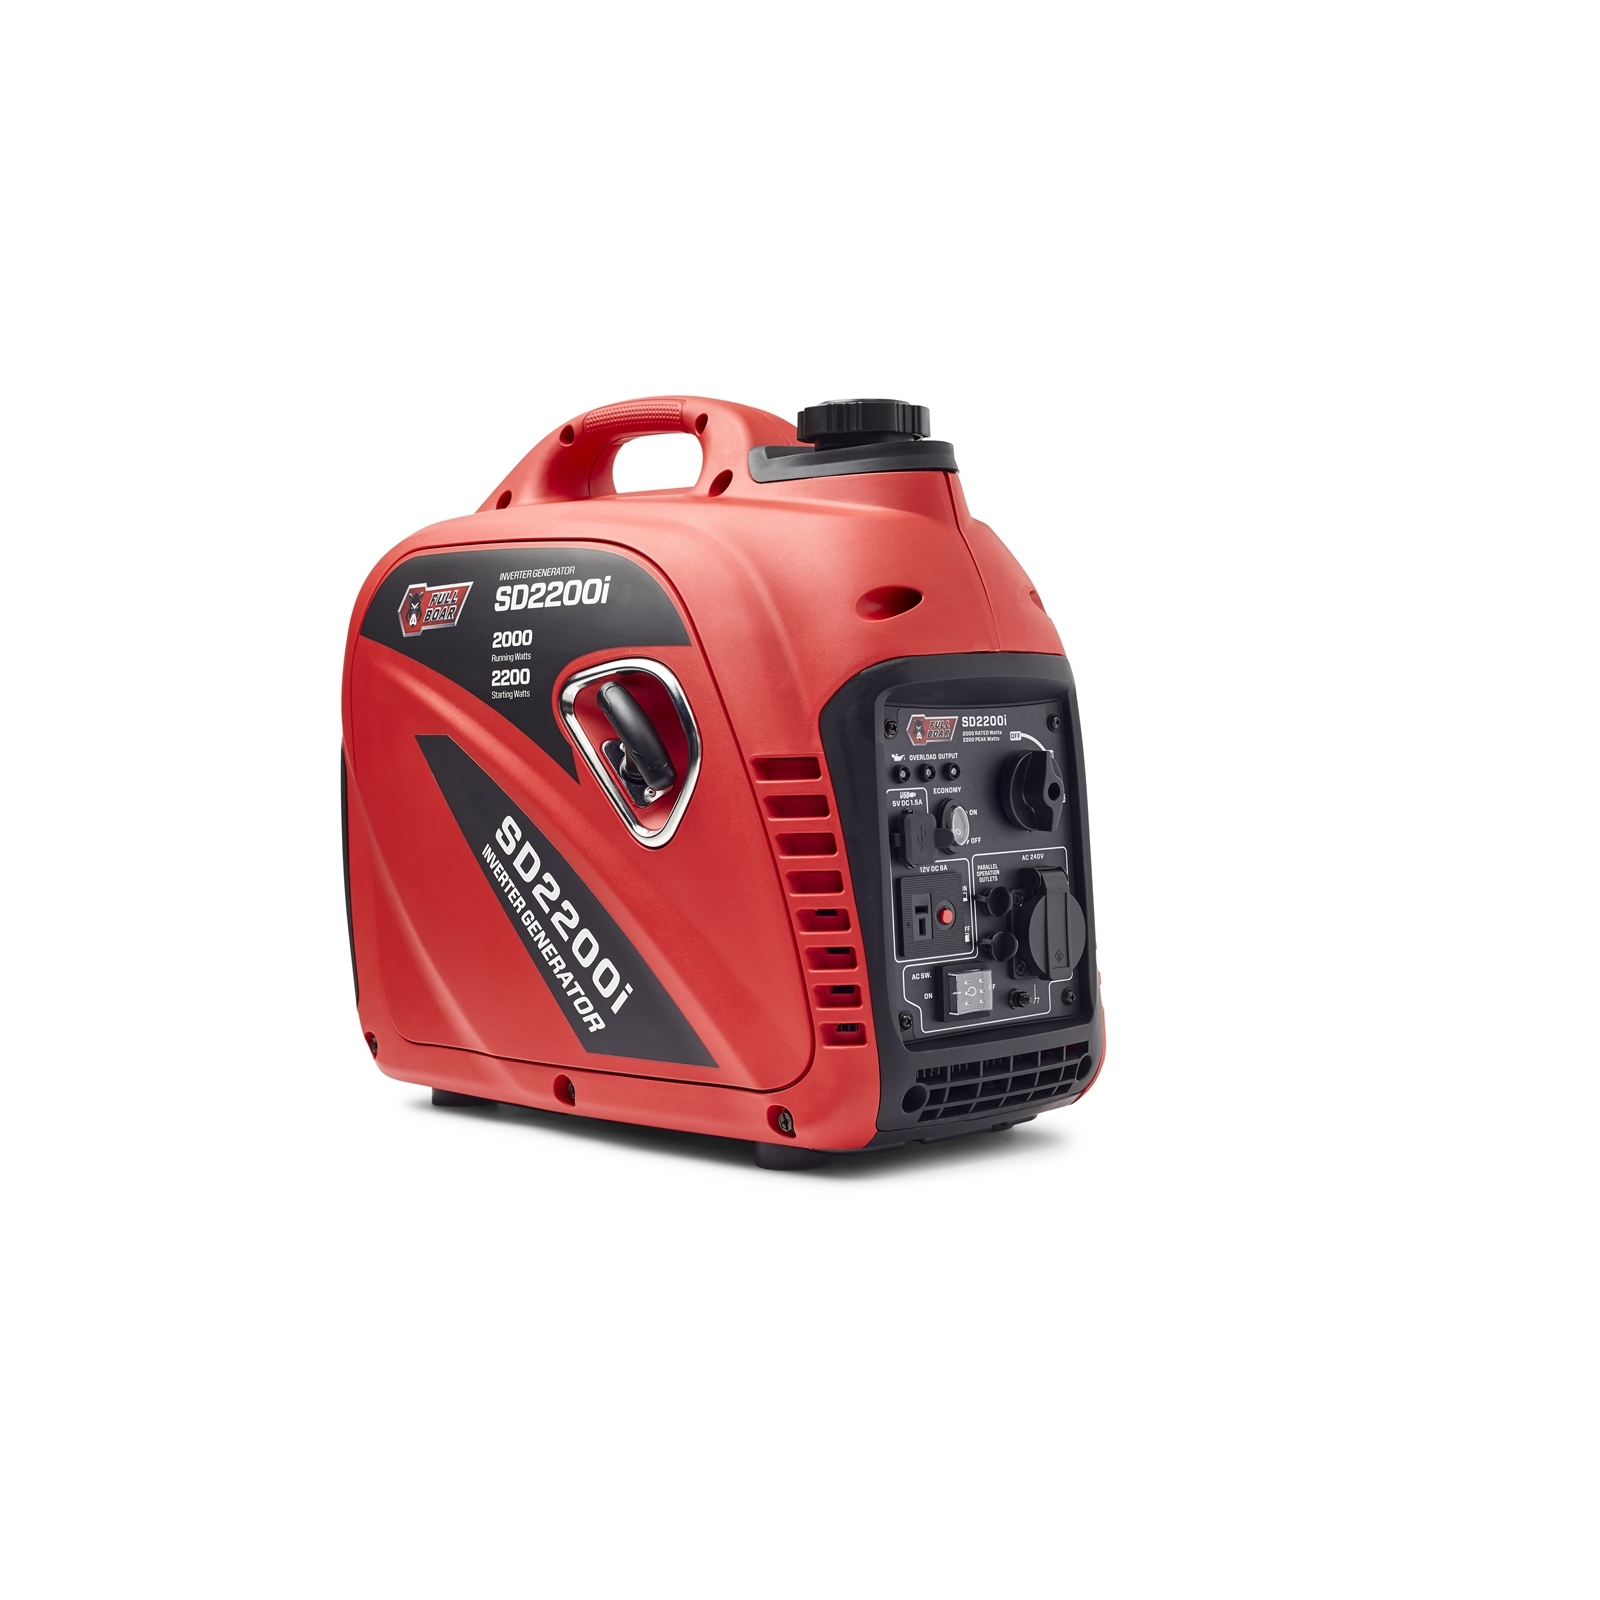 Full Boar 2200W Inverter Petrol Generator